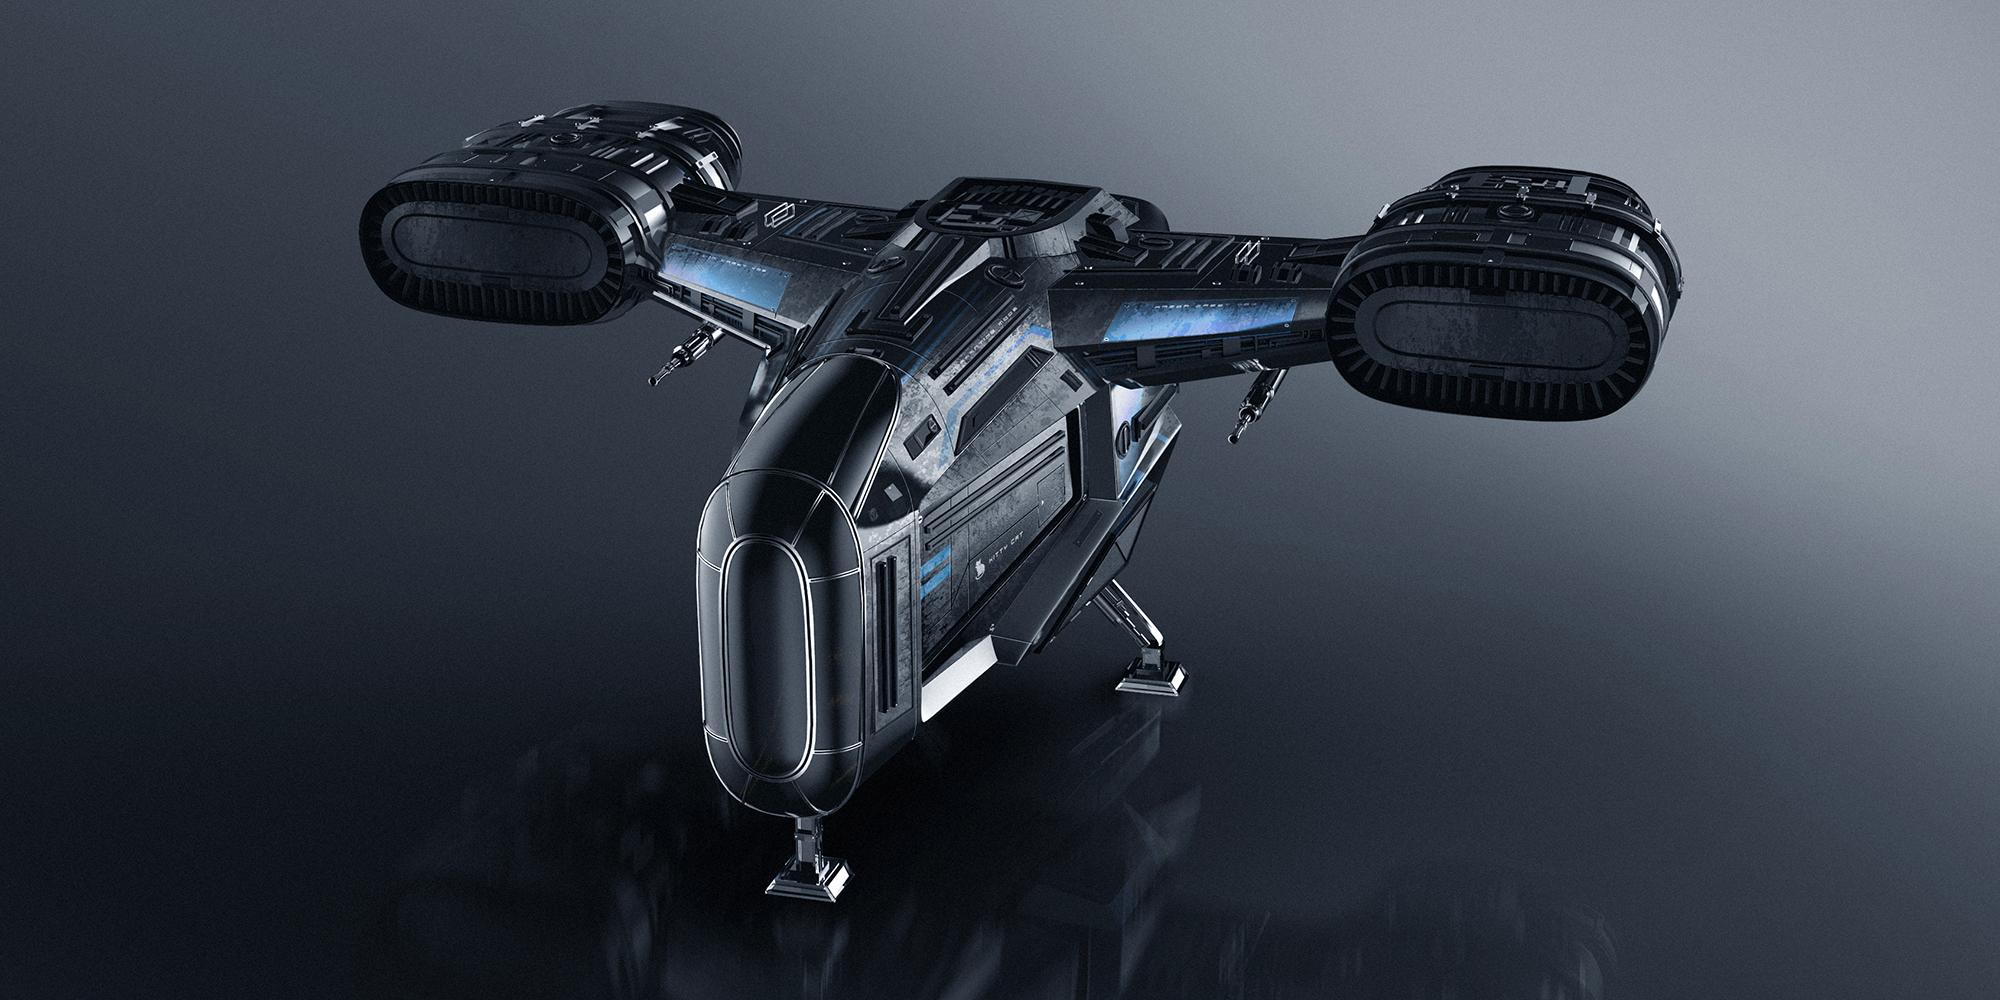 spaceship_007_front_2_web